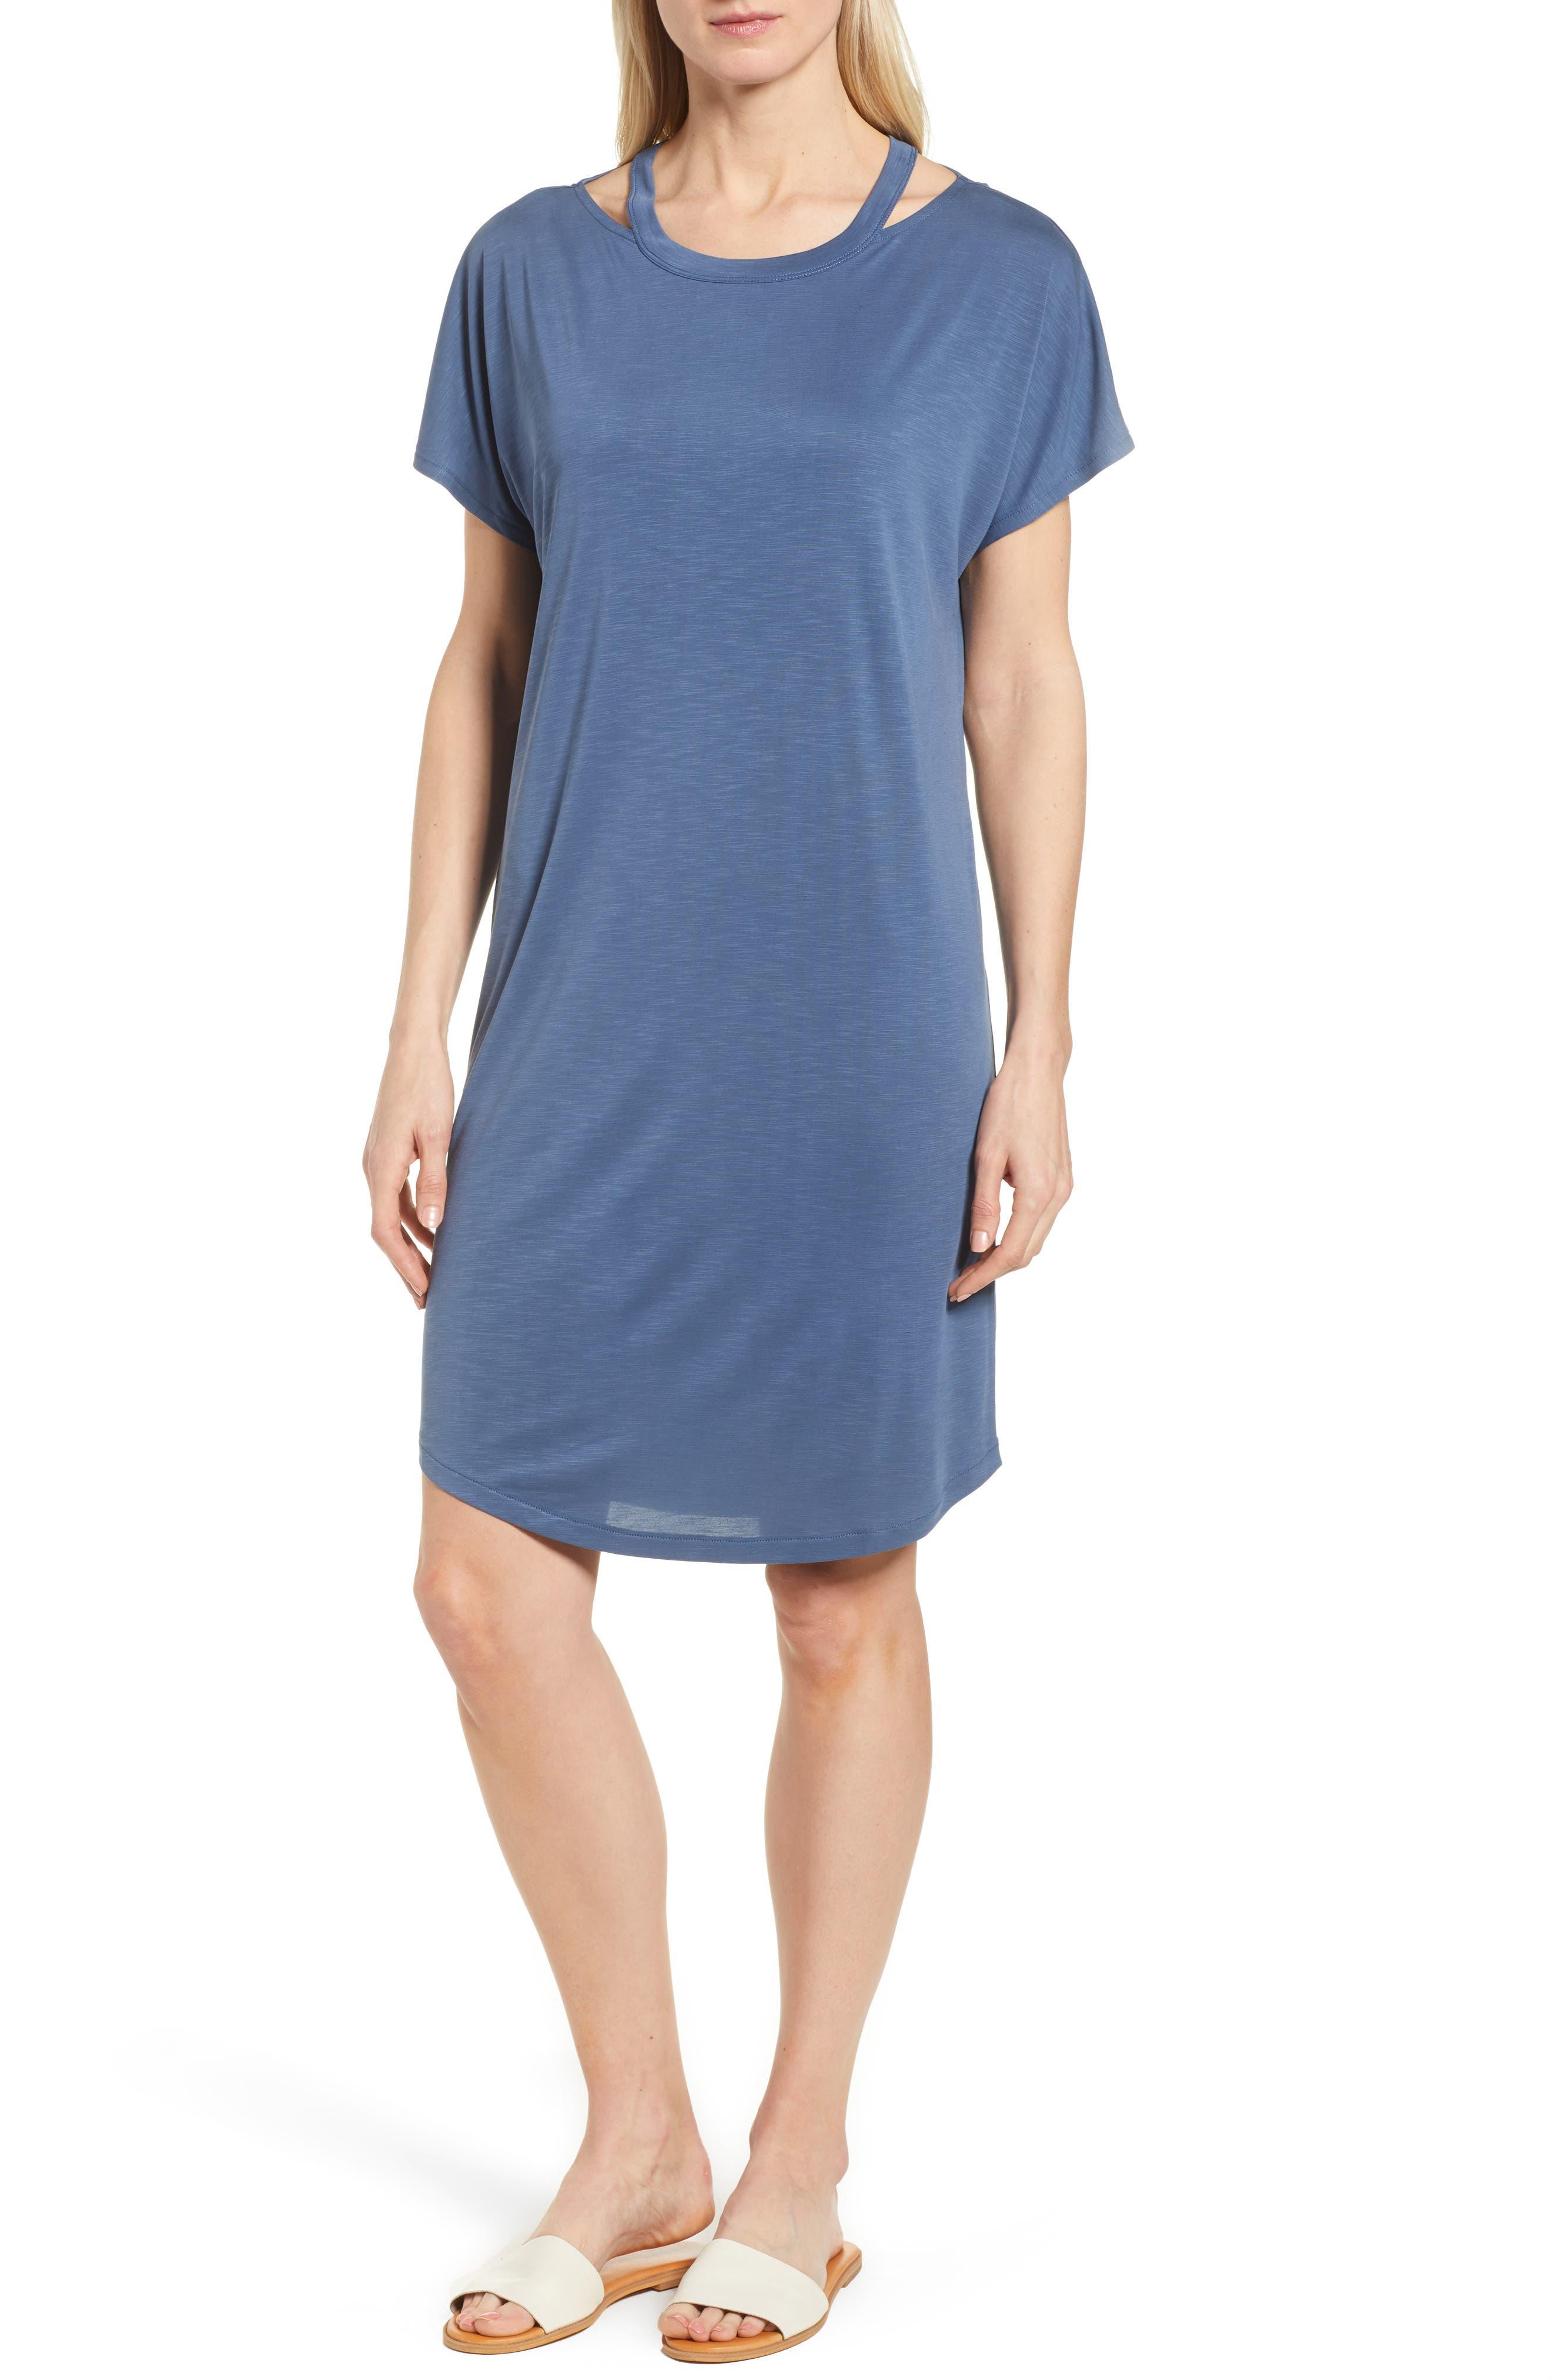 Open Road Dress,                         Main,                         color, 490